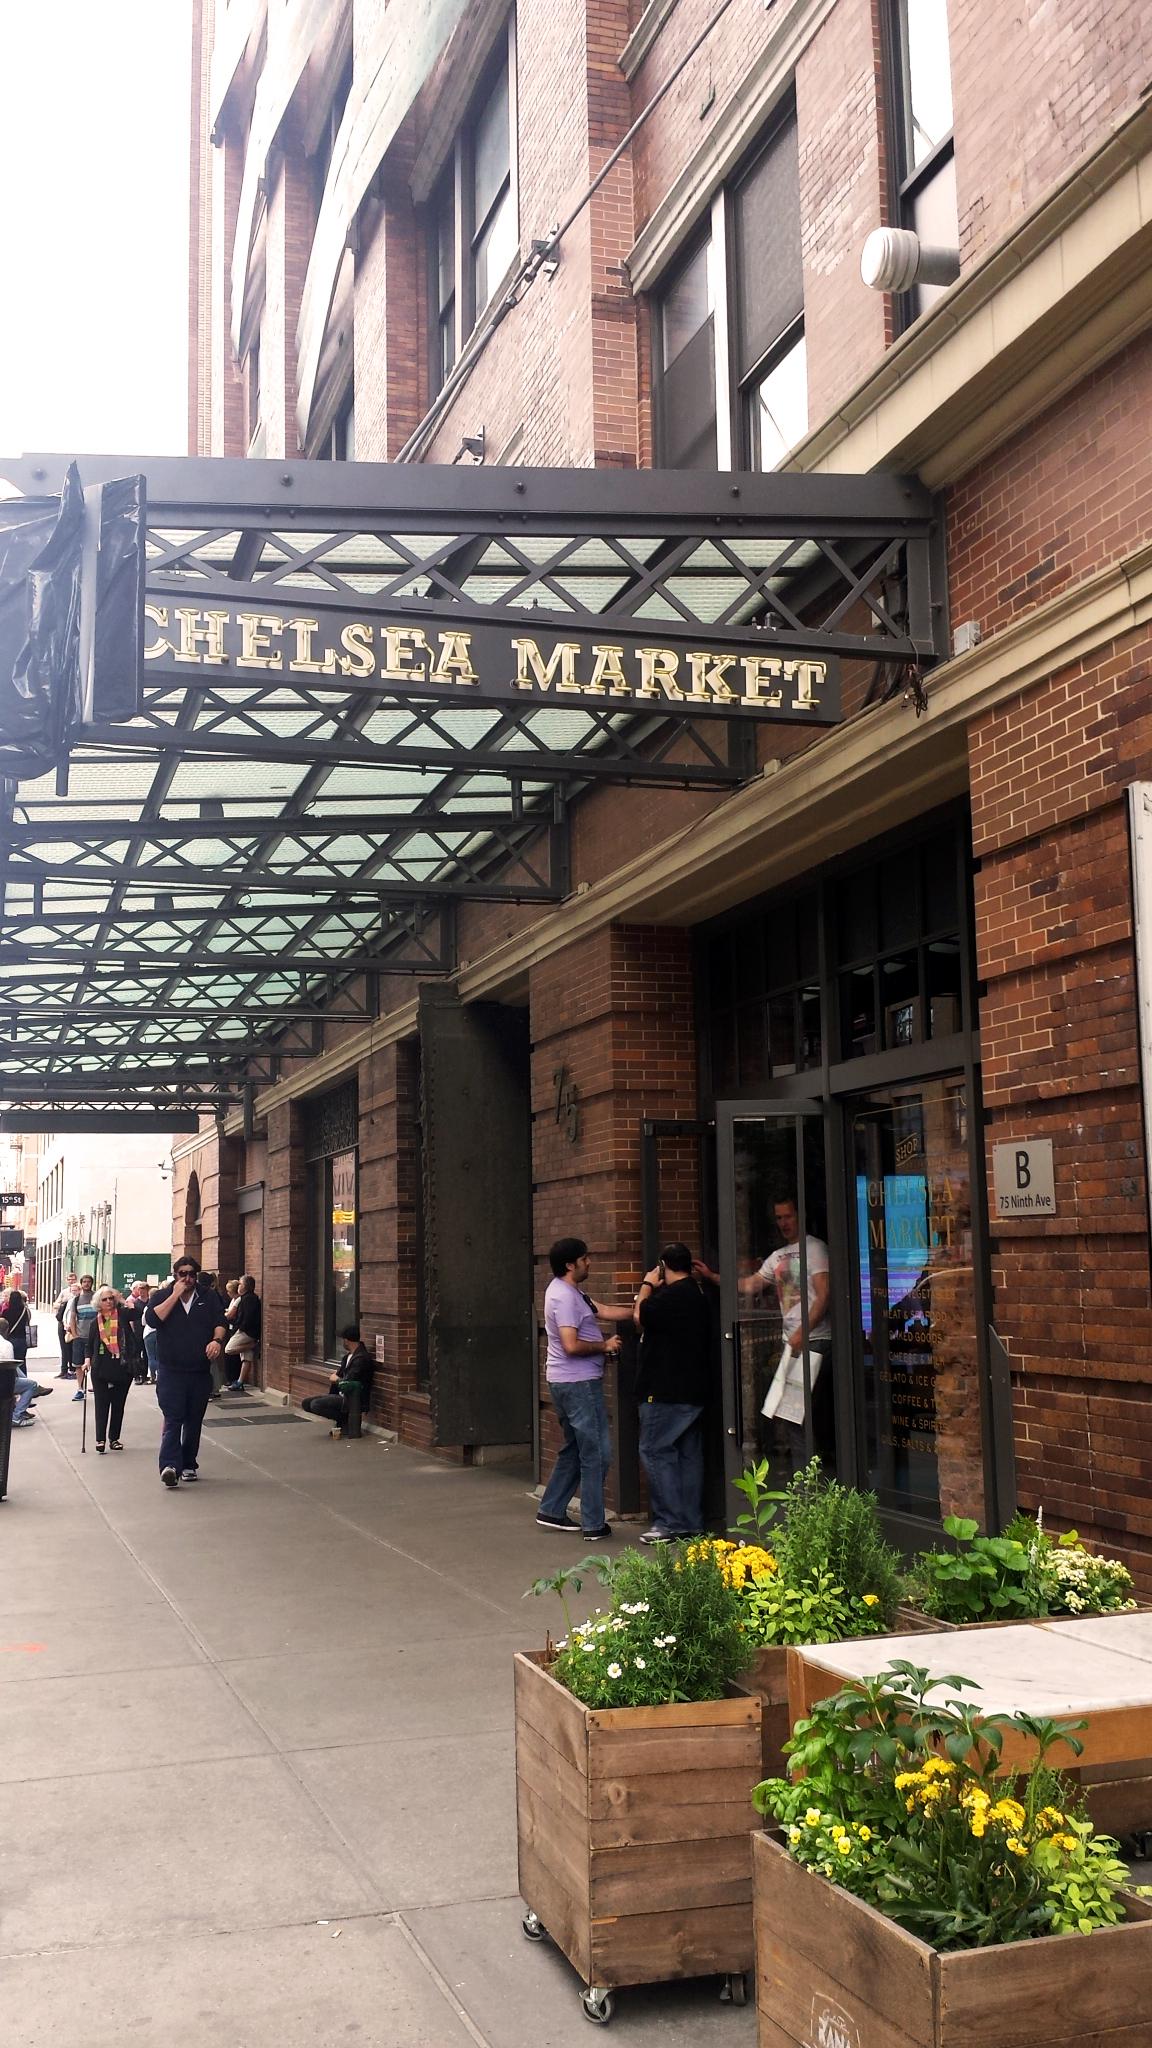 chelsea market 2